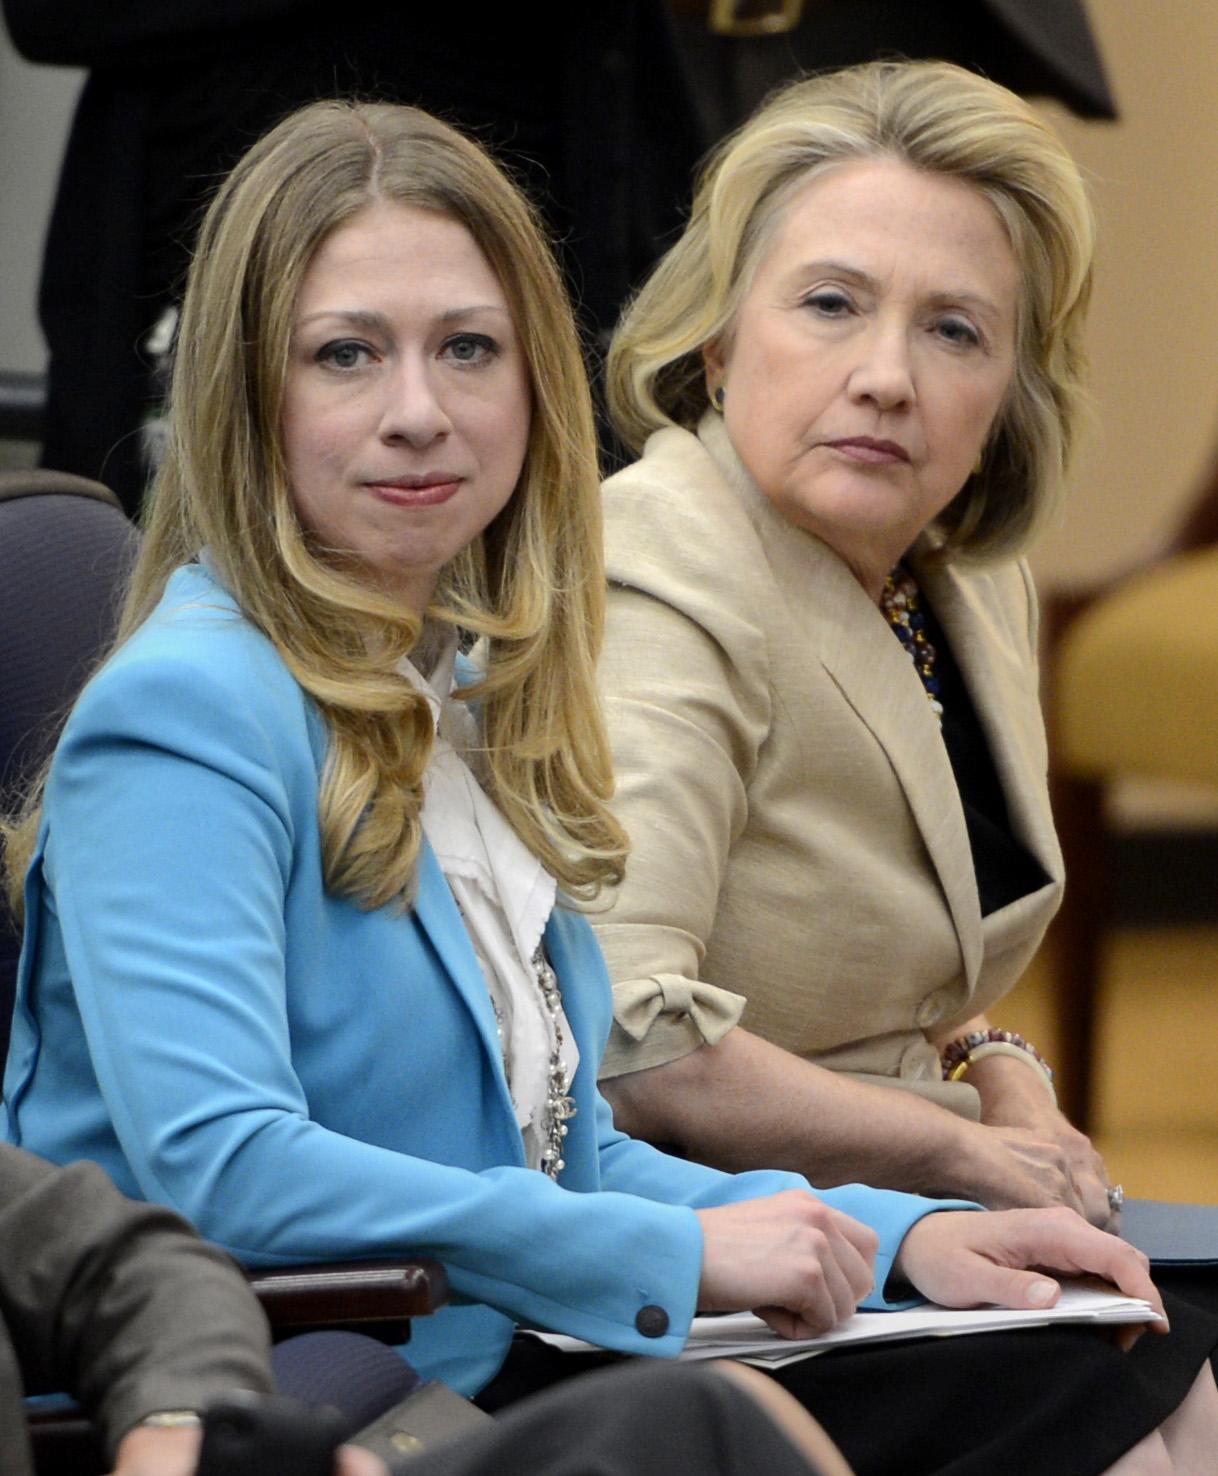 Clinton Chappaqua House More Gratuitous Chelsea Clinton Bashing Blazing Cat Fur